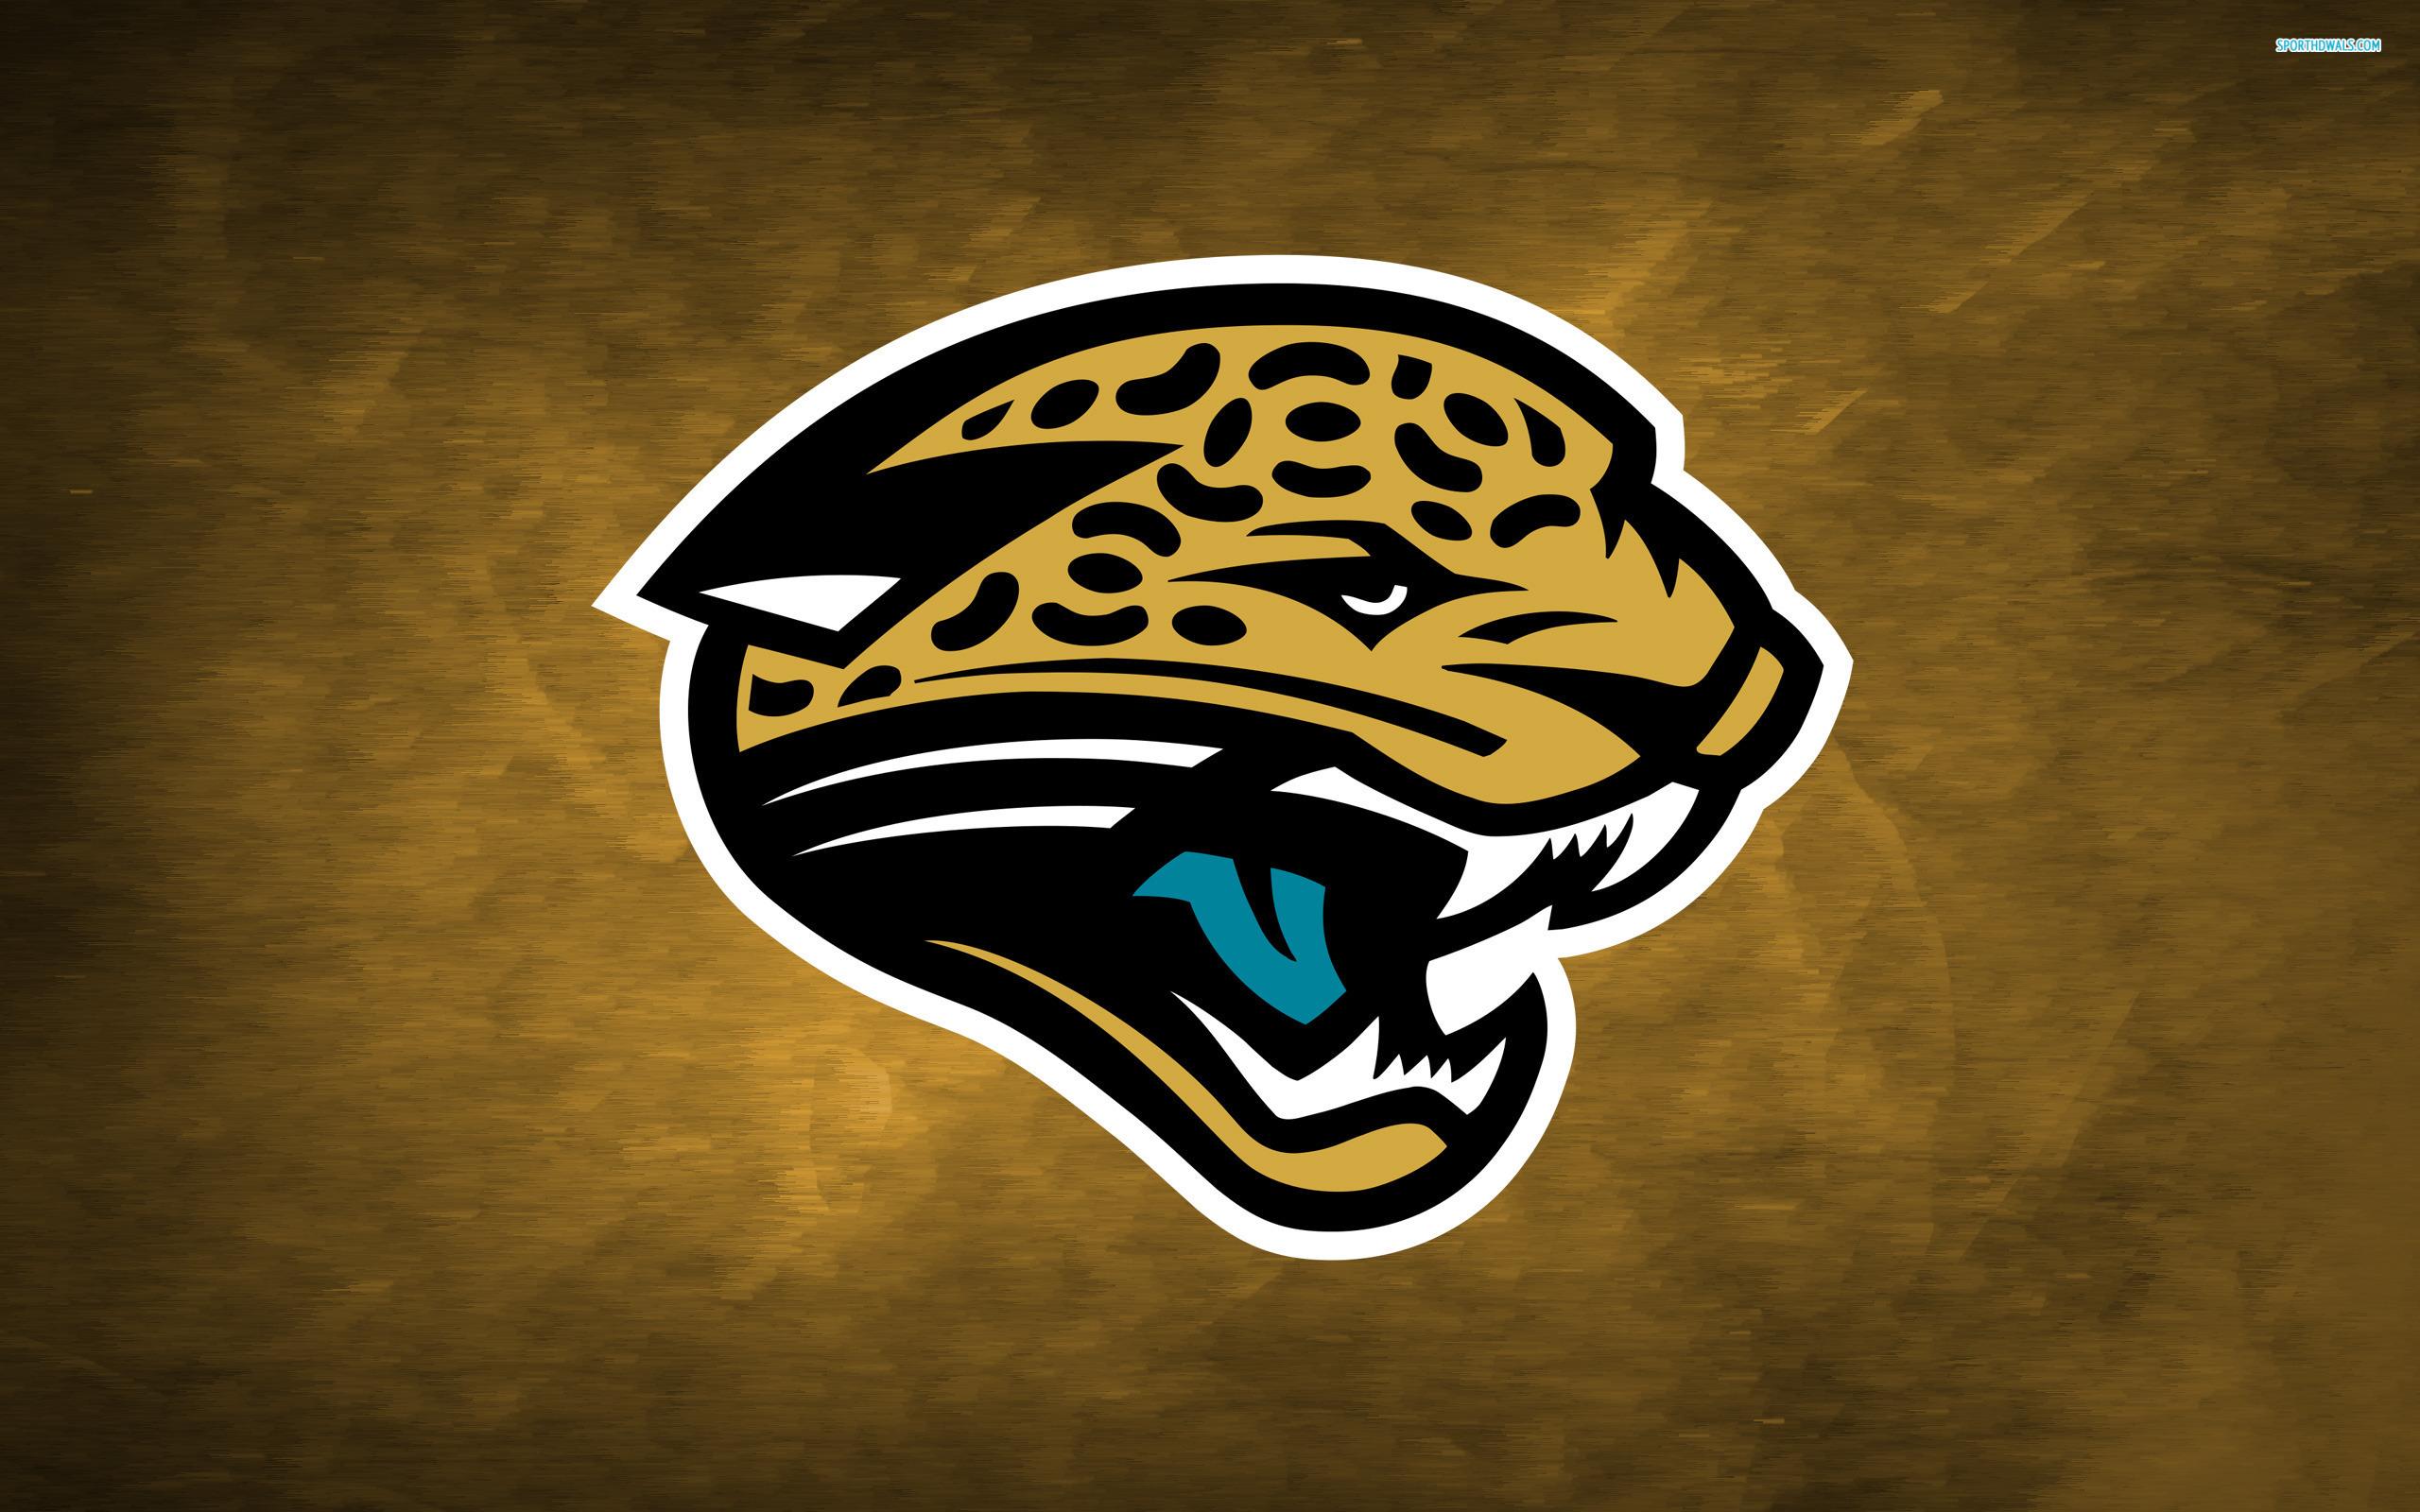 logo-jacksonville-jaguars-wallpaper